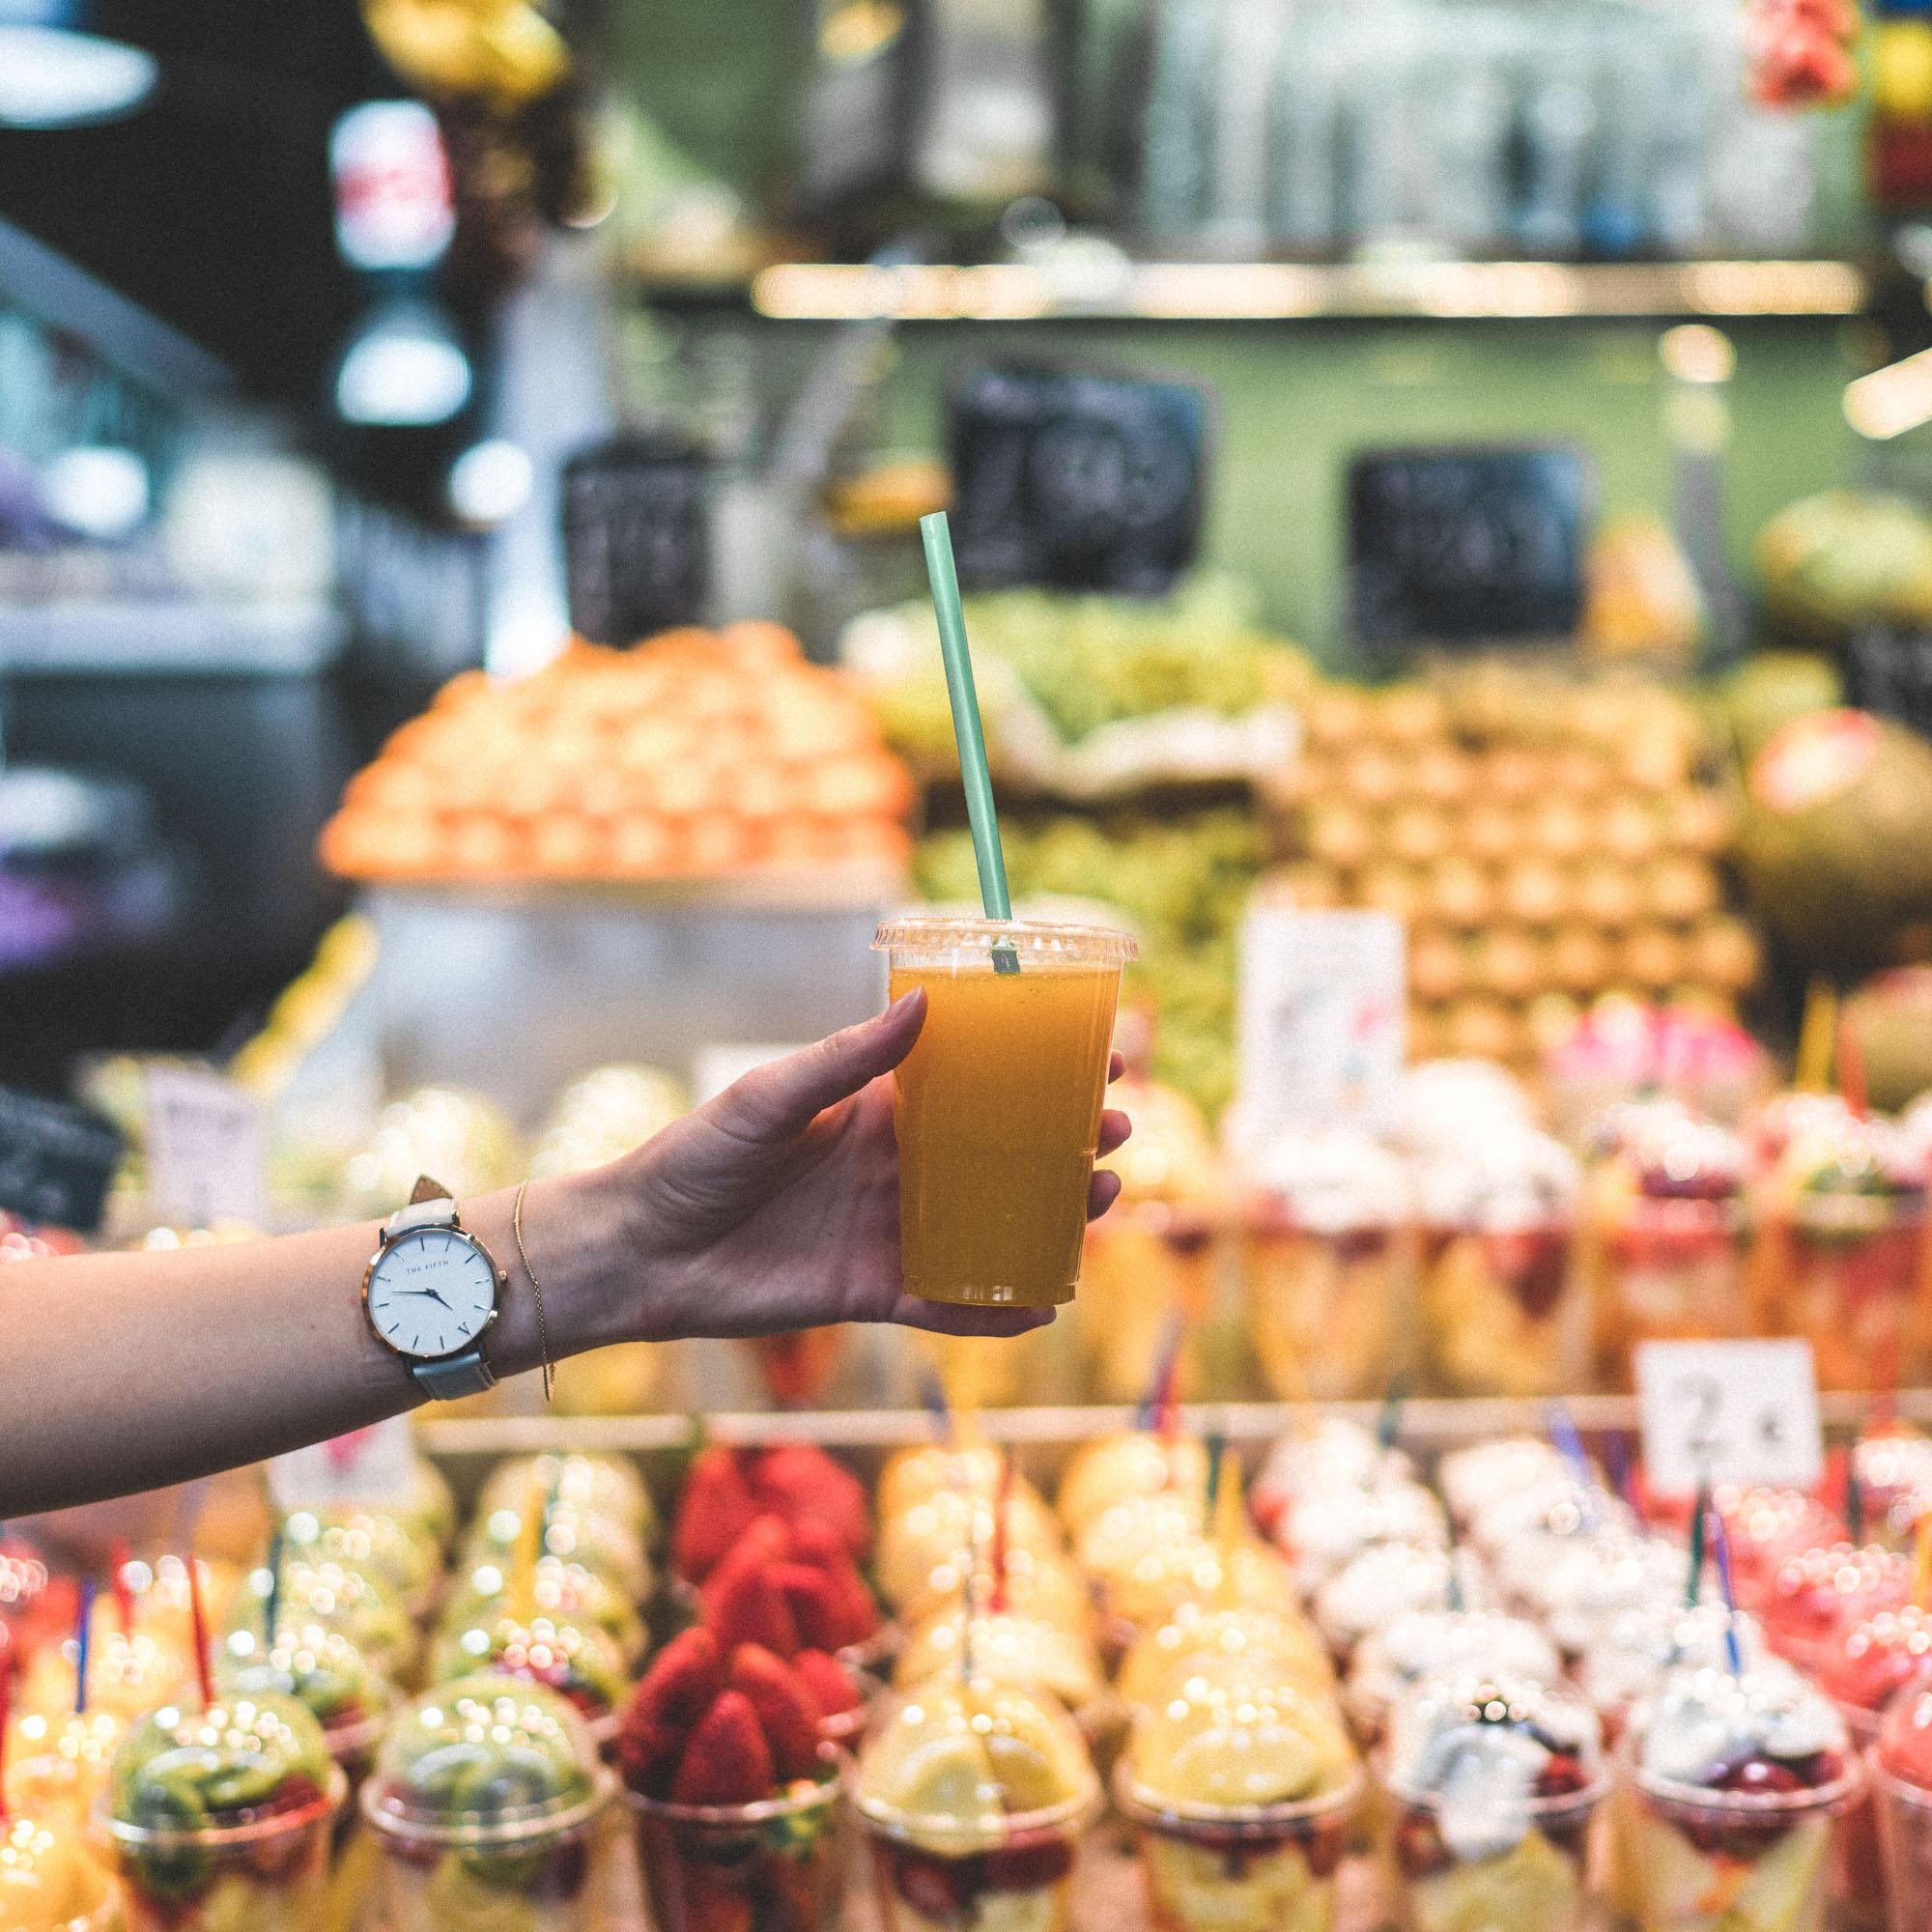 Mercado de la Boqueria for fresh juice and spanish tapas - Barcelona, Spain